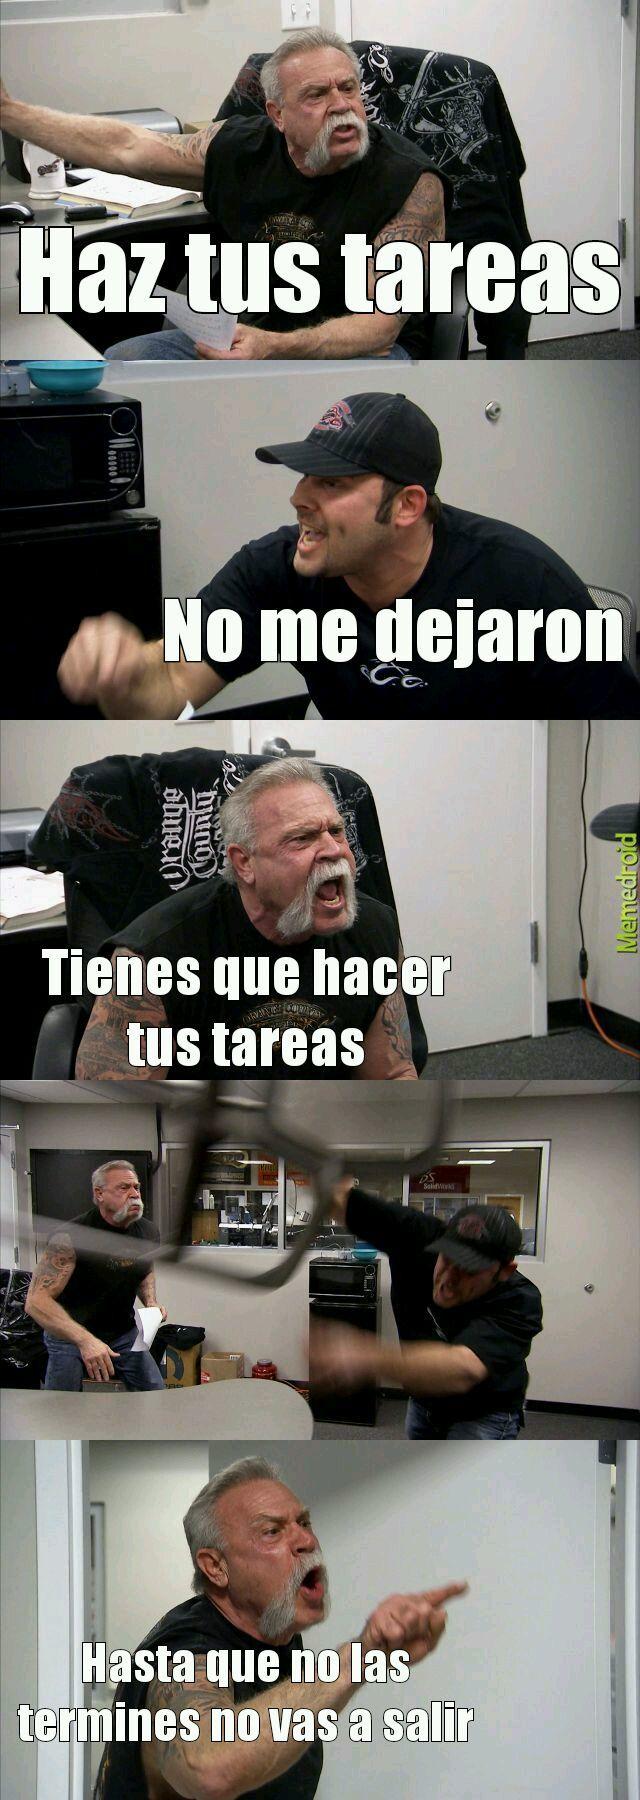 Típica madre latinoamerica - meme